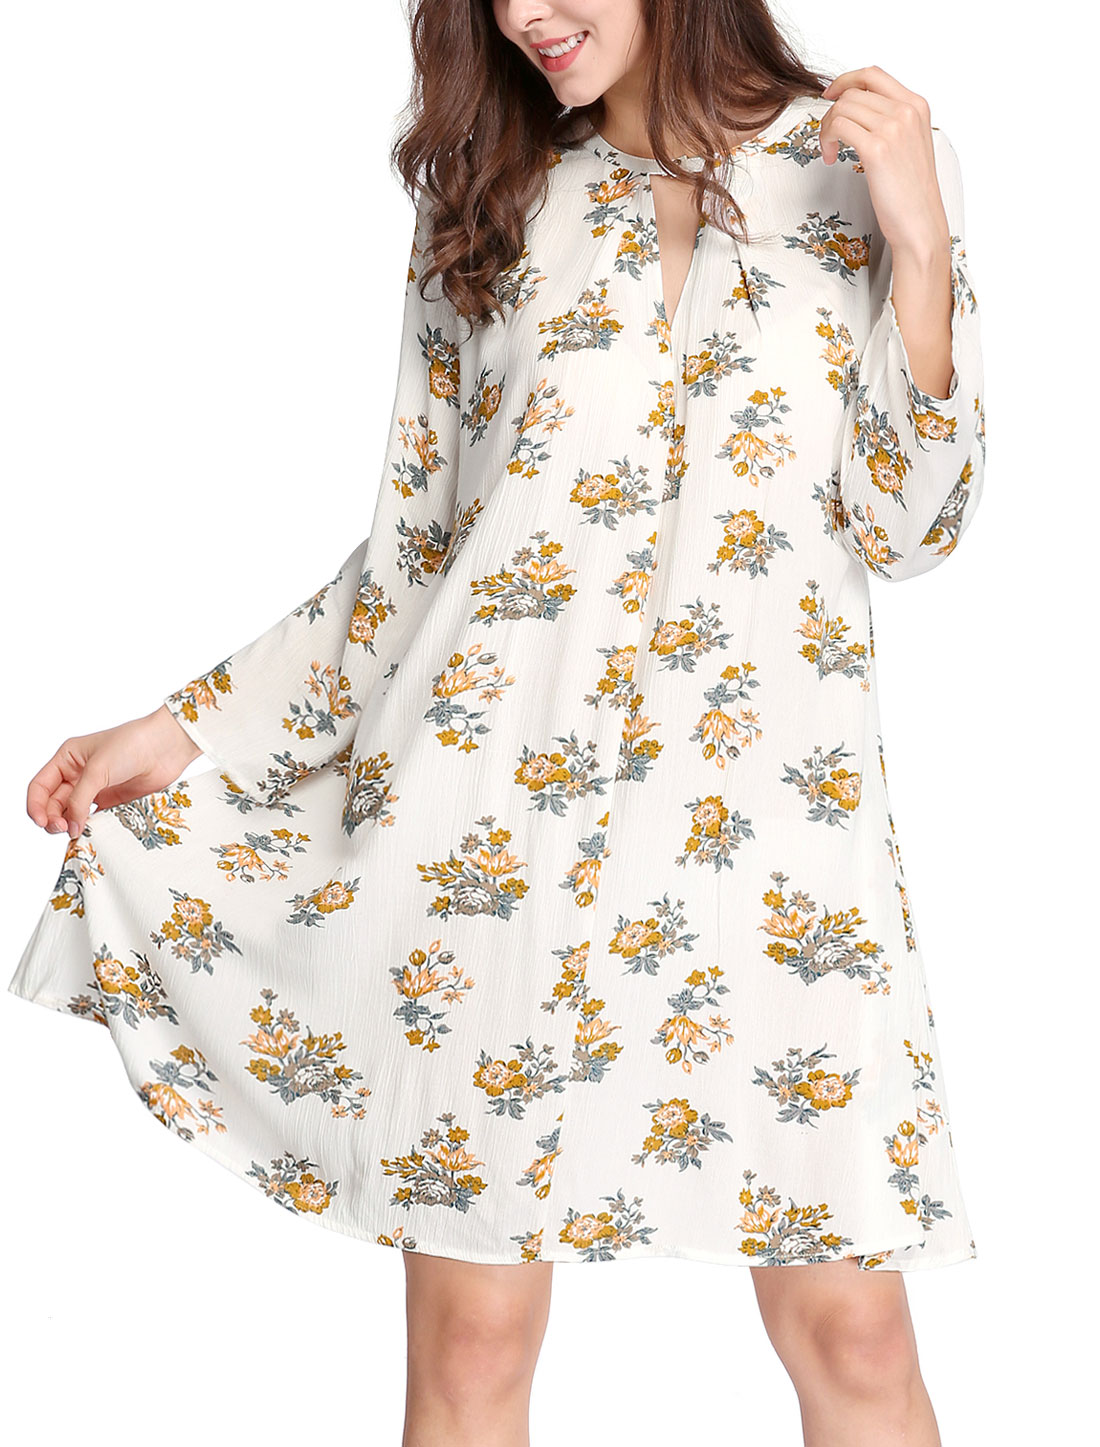 Women Keyhole Front Floral Prints Oversized Swing Dress White XS